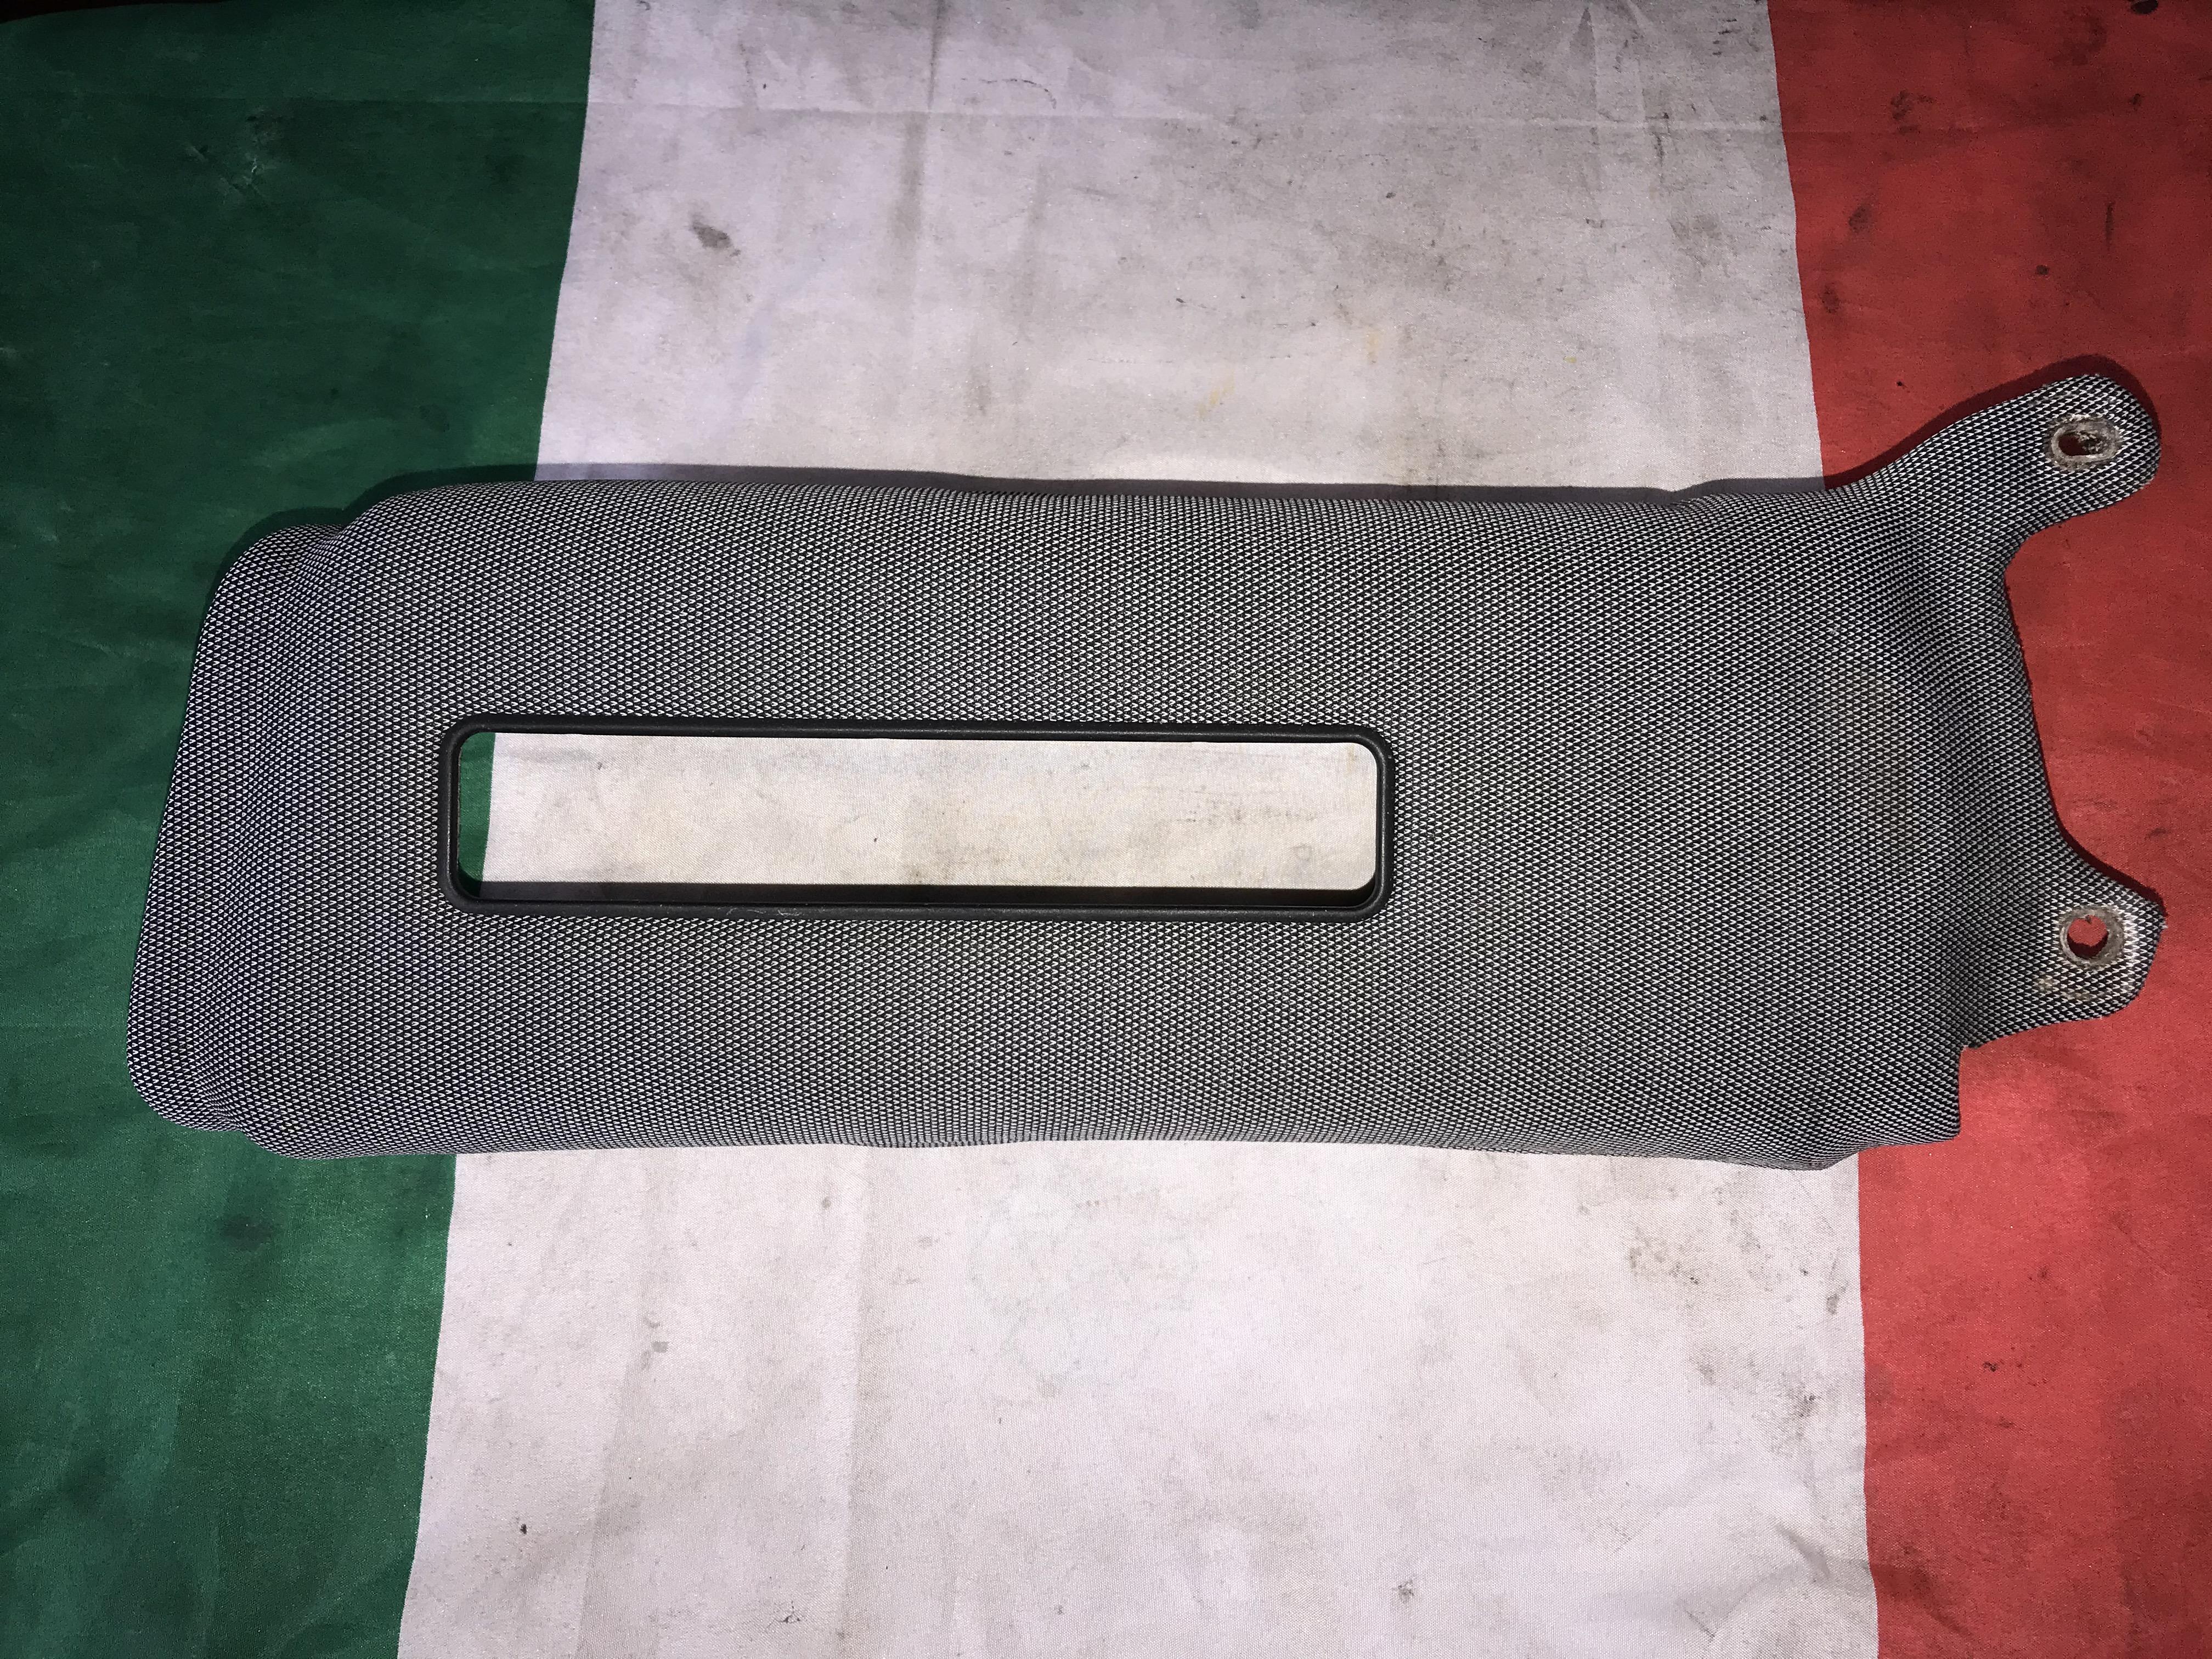 Alfa Romeo GTV 916 Limited Edition Cup B-pillar Cover Panel, Right Dx B-post